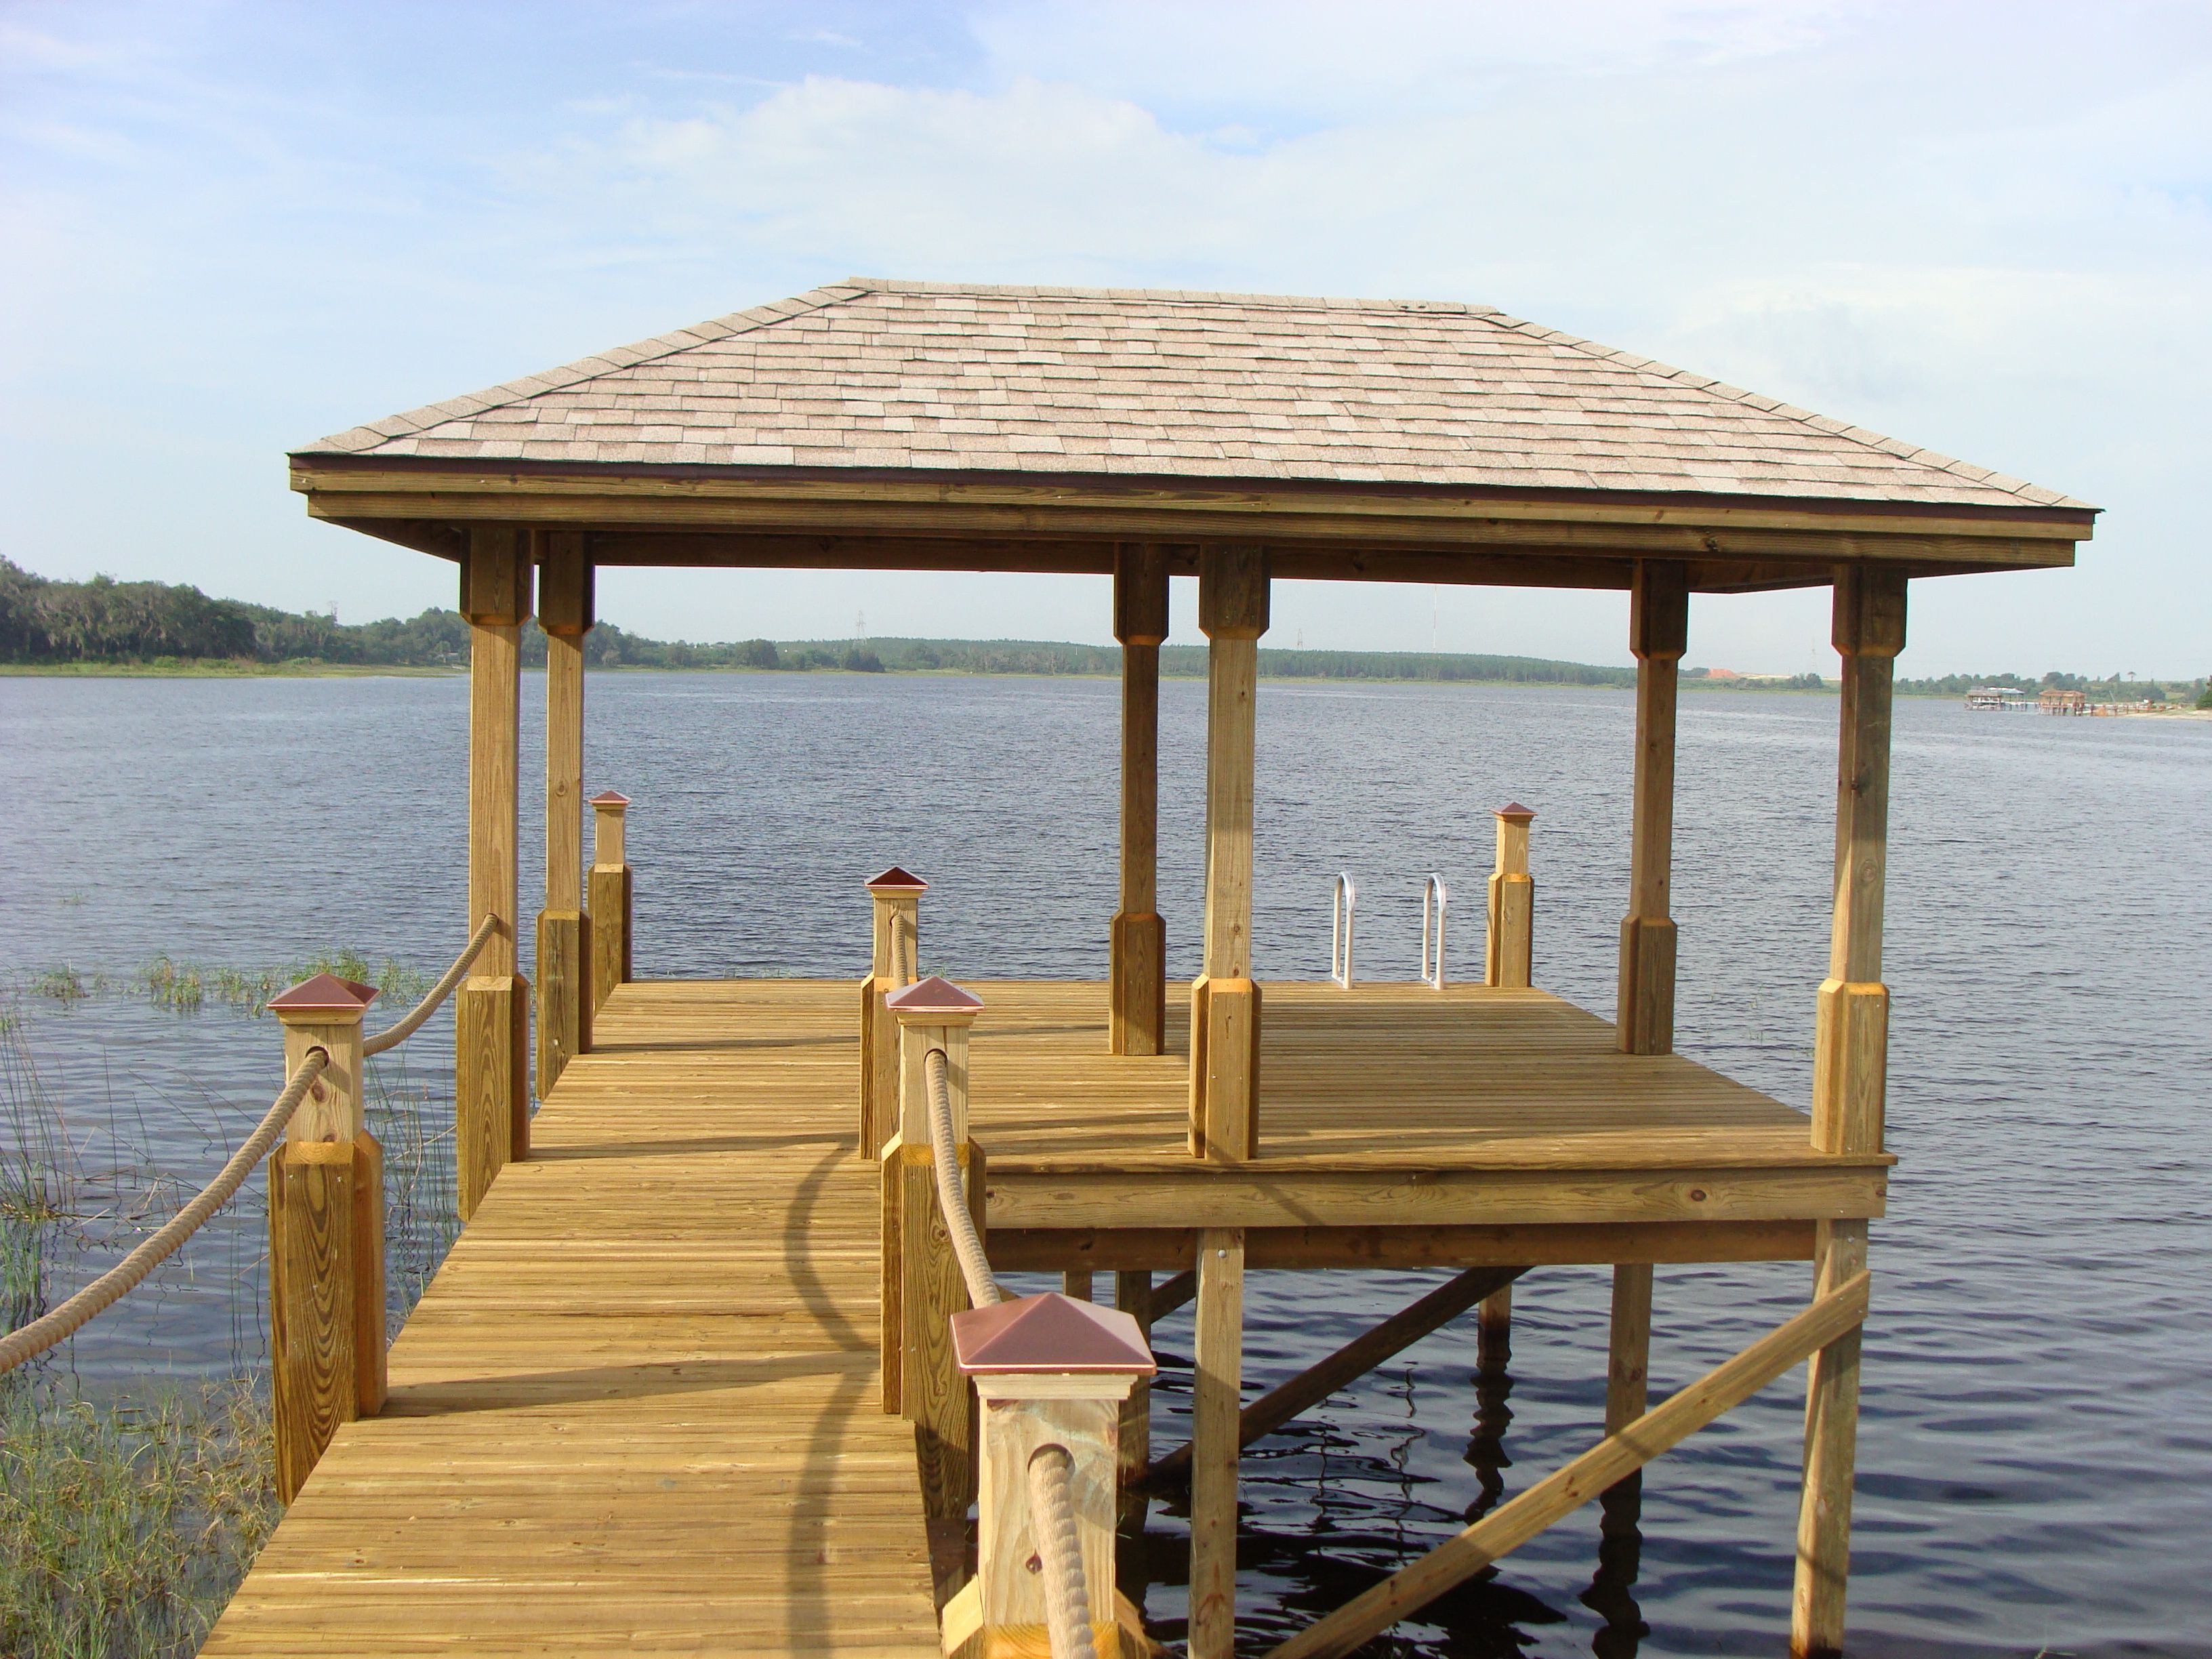 Boat Shelter Aluminum Roof : Dock shelter this roof pinterest pond